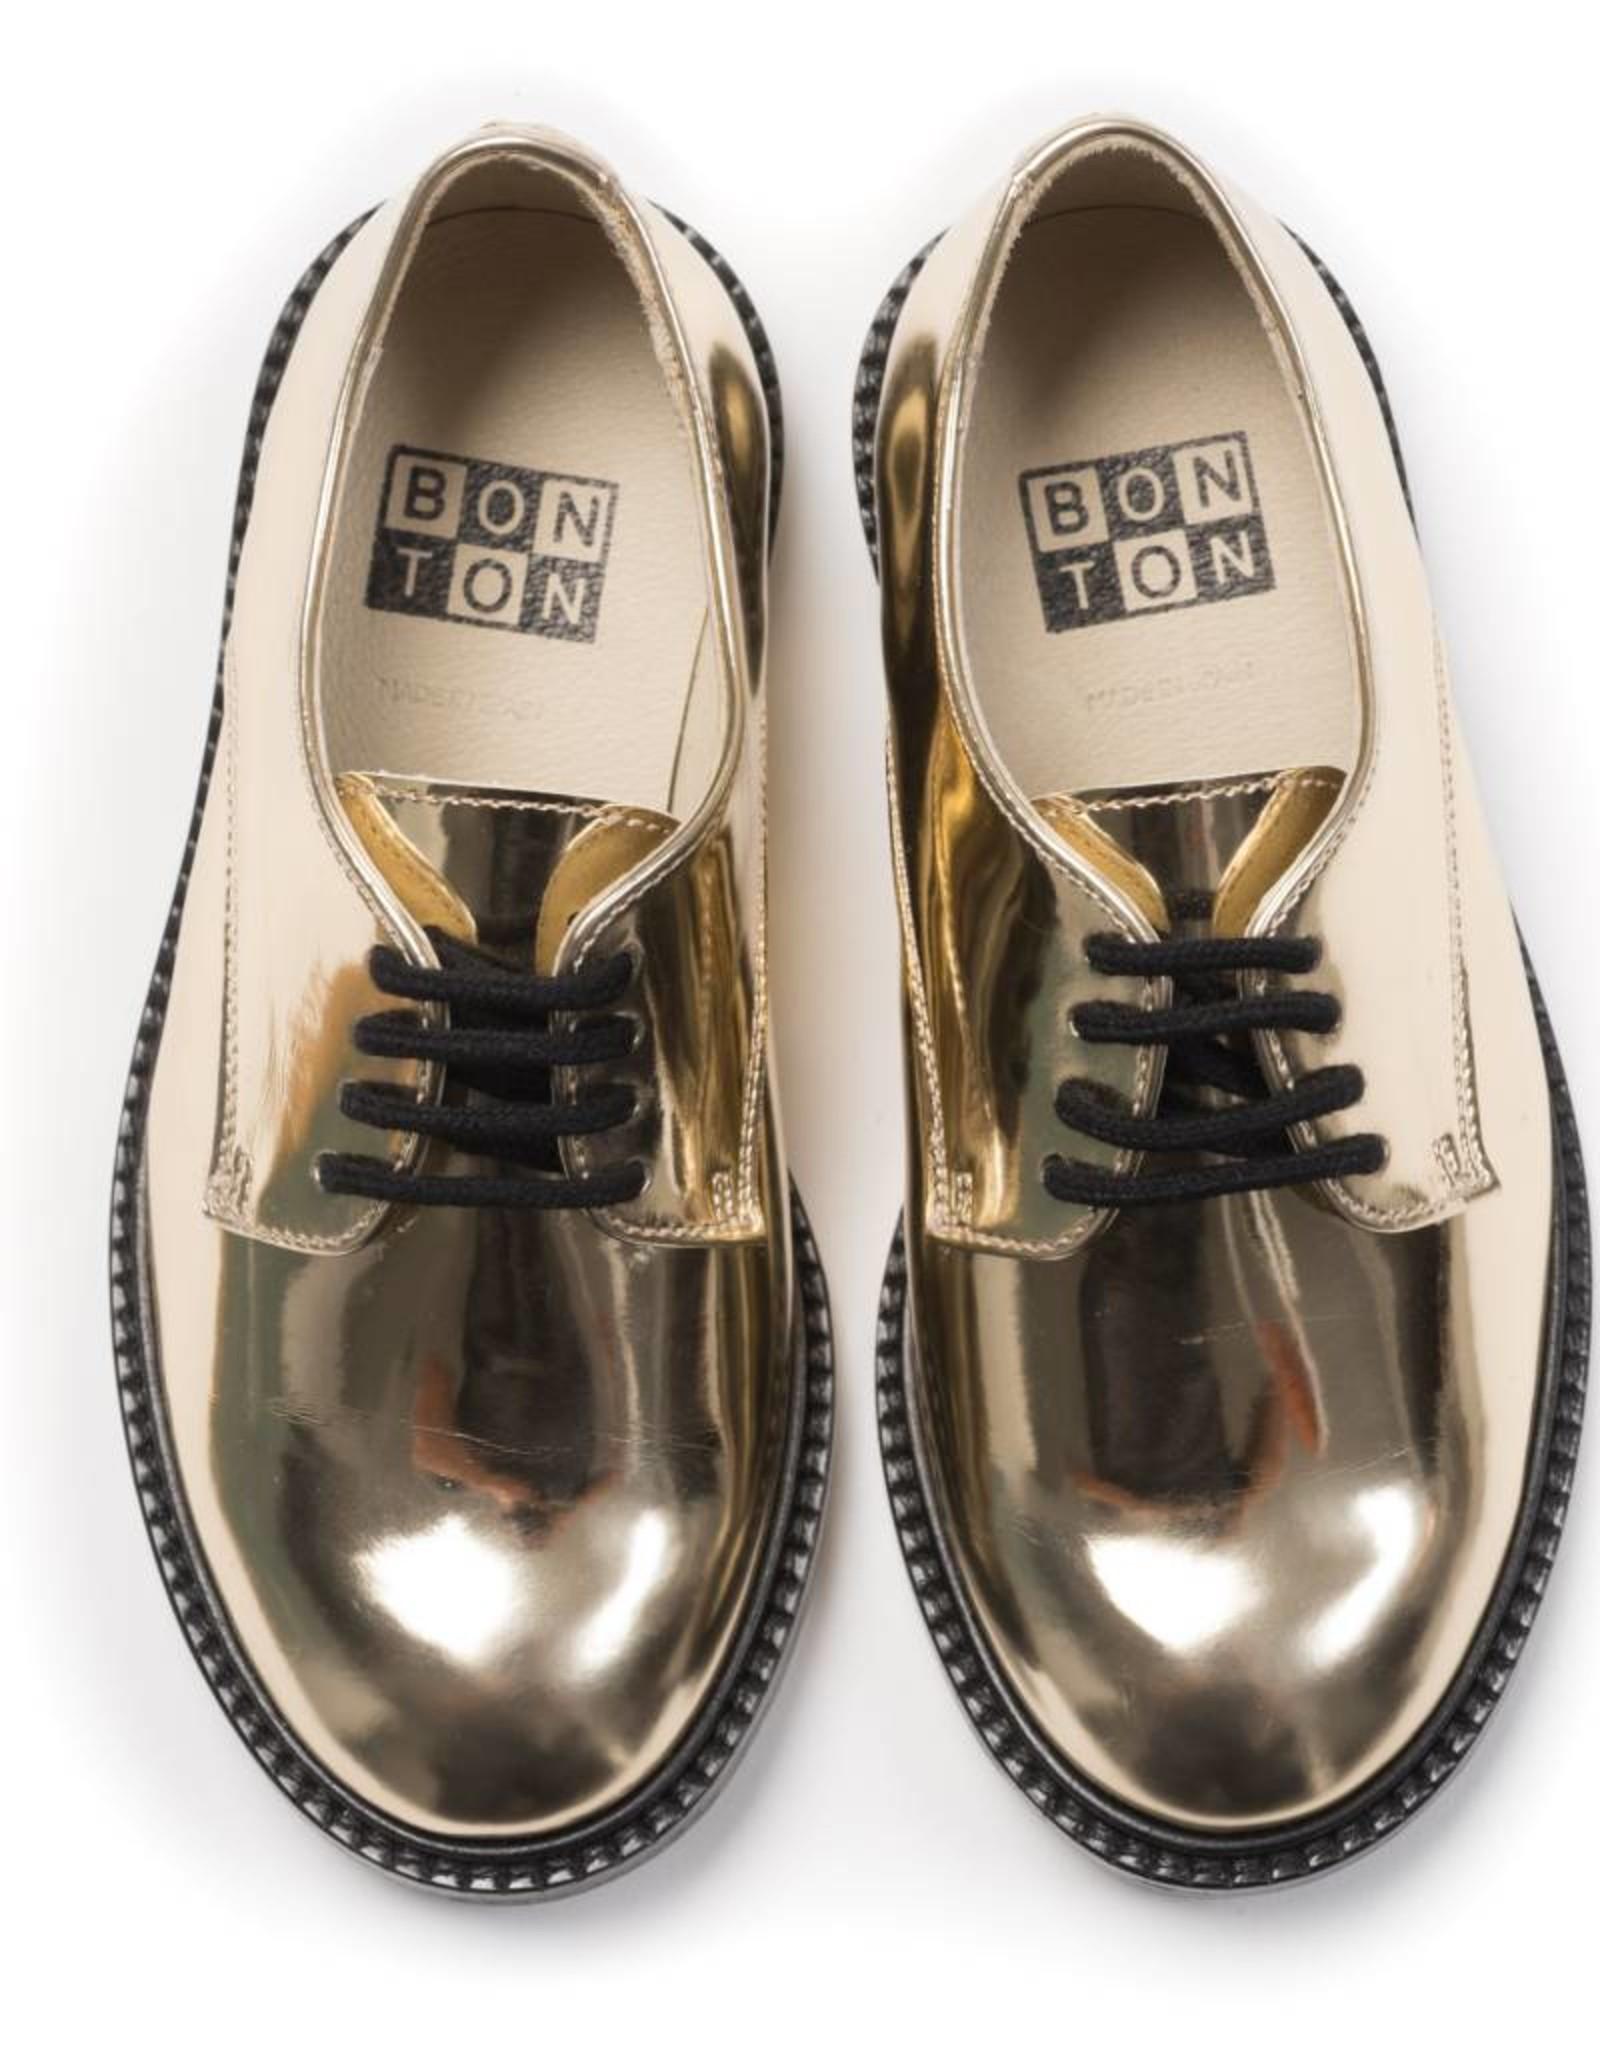 Bonton Adele Derby shoes, mirror effect